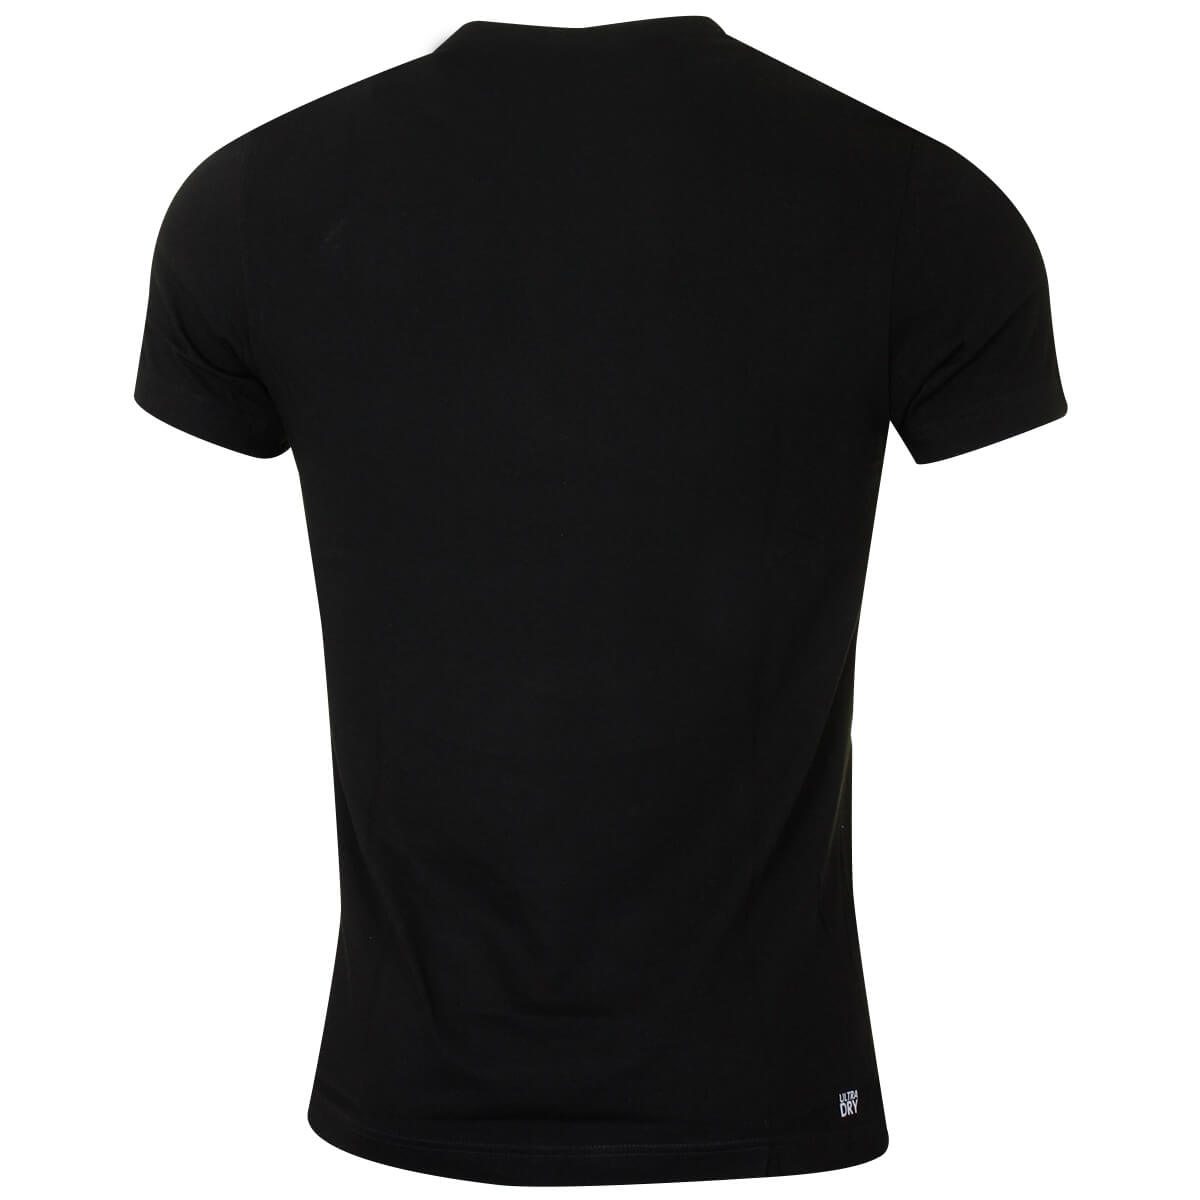 Lacoste-Mens-Oversized-Crocodile-Ultra-Dry-Cotton-Blend-T-Shirt-30-OFF-RRP thumbnail 3